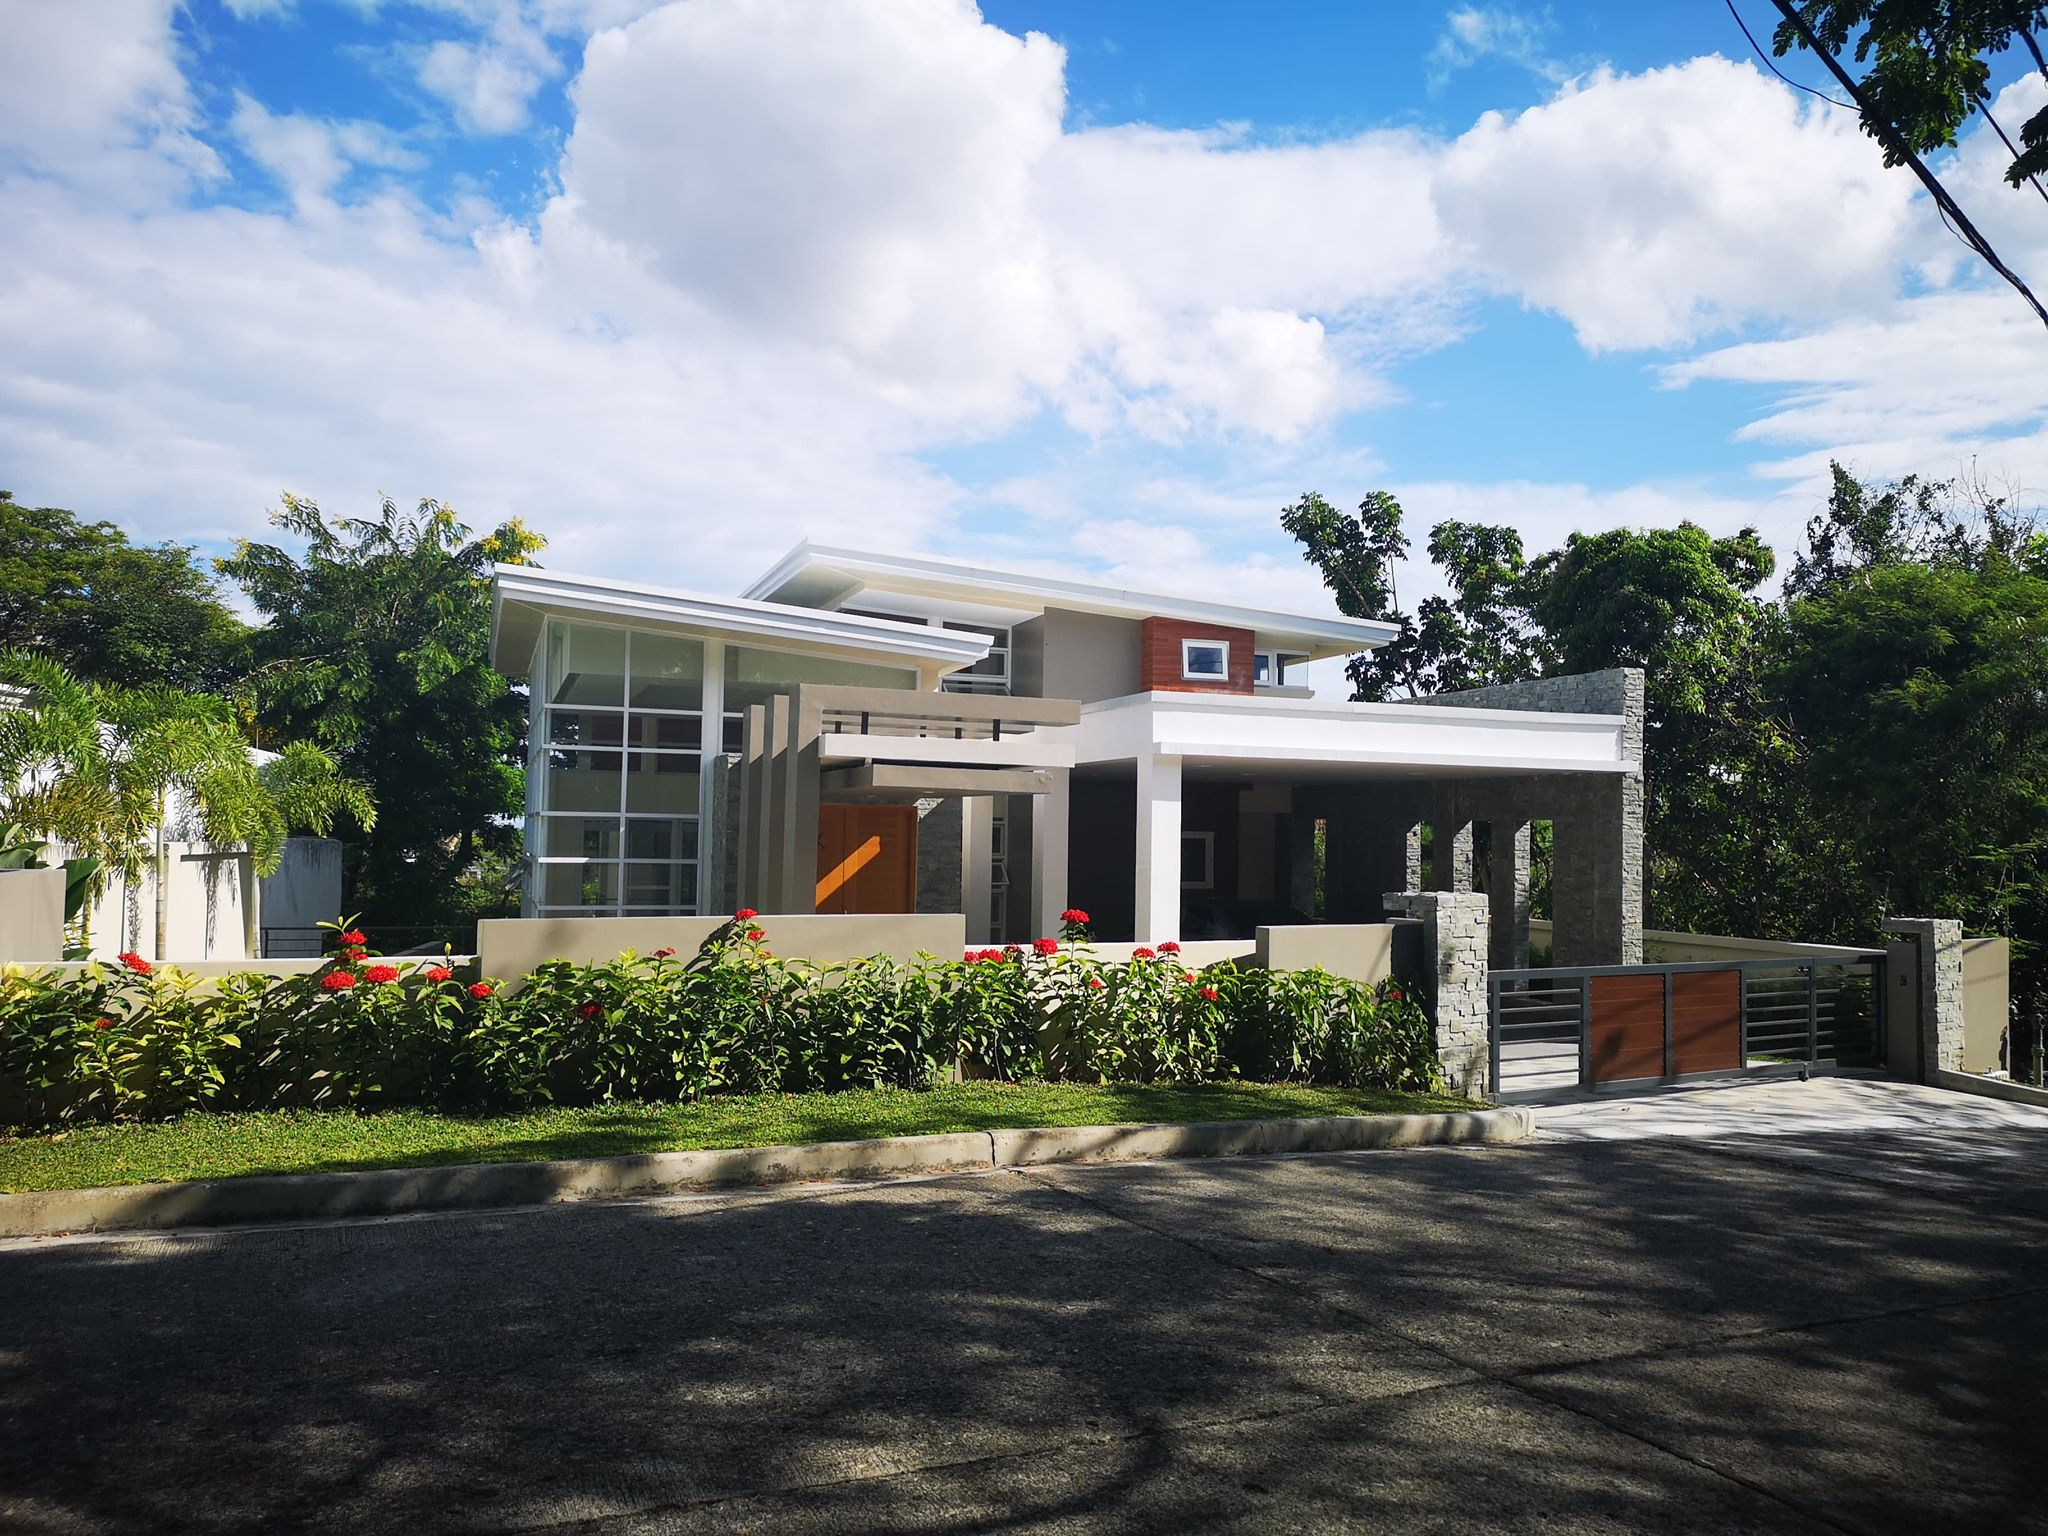 5BR Banilad house for sale Maria Luisa Cebu City with elevator